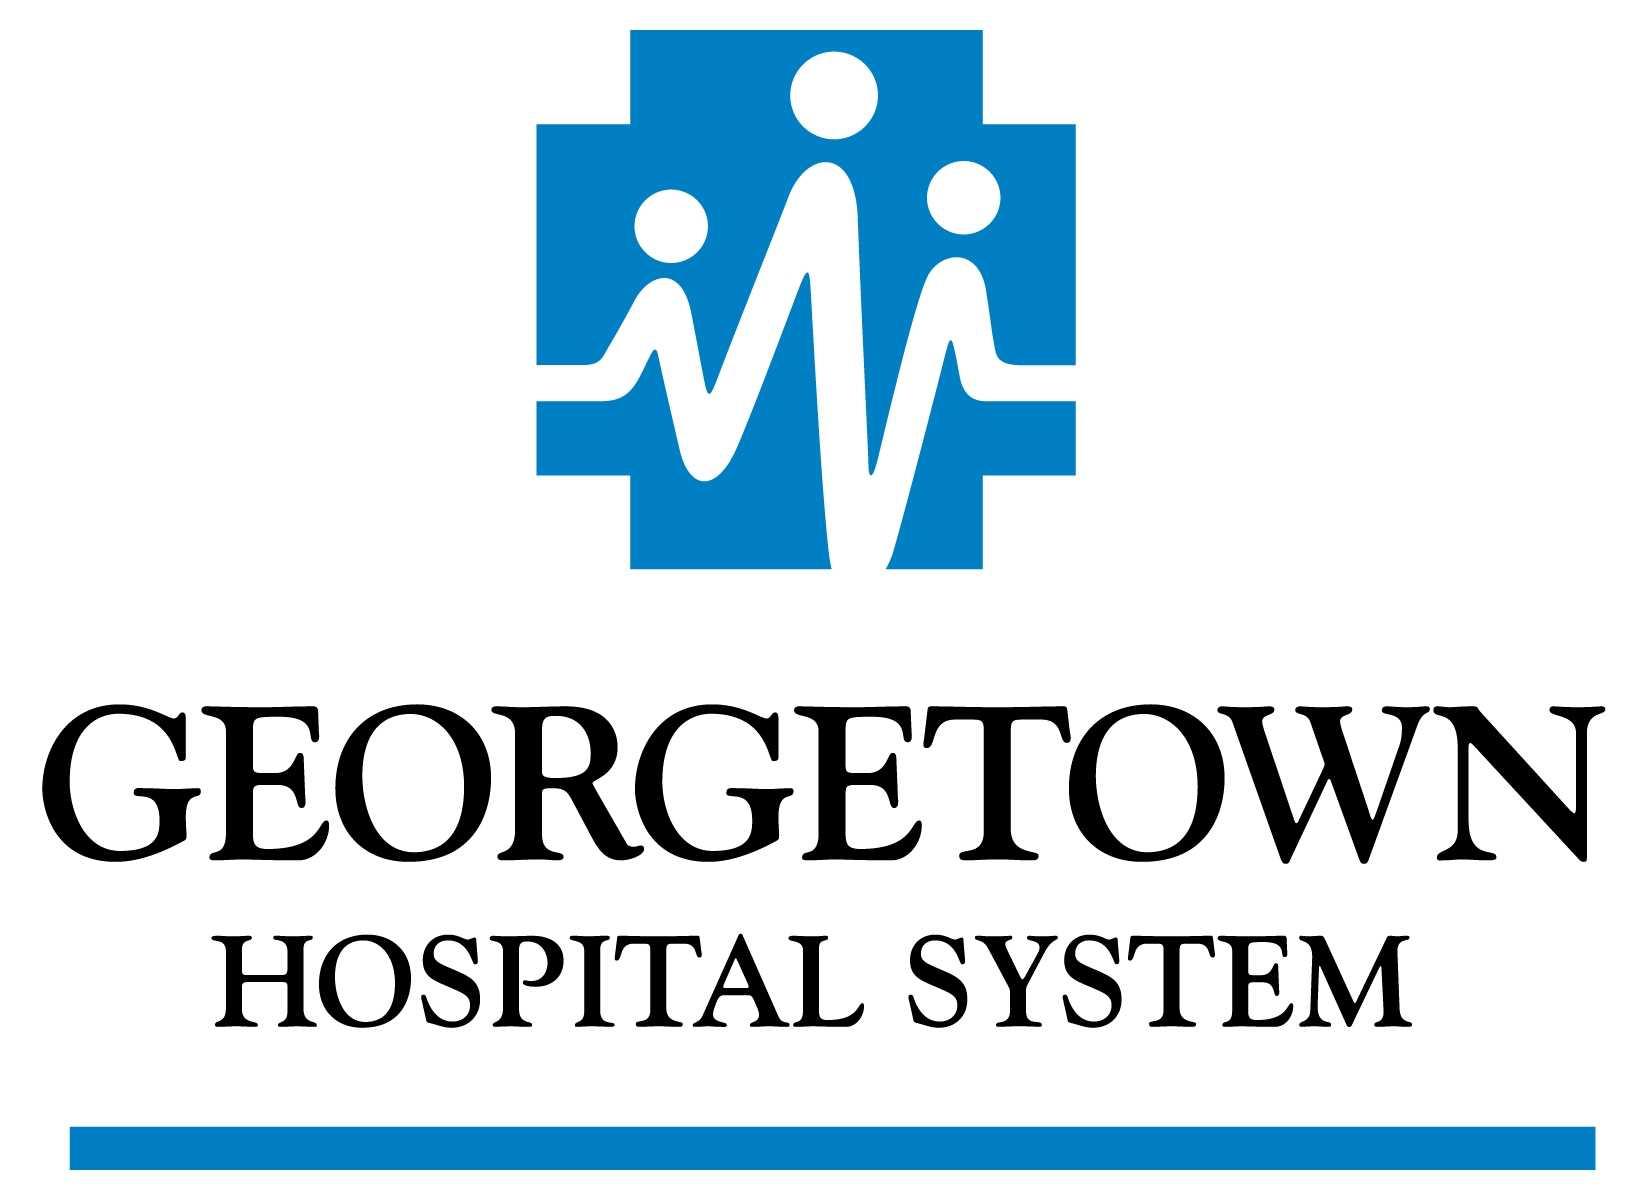 Georgetown Hospital System